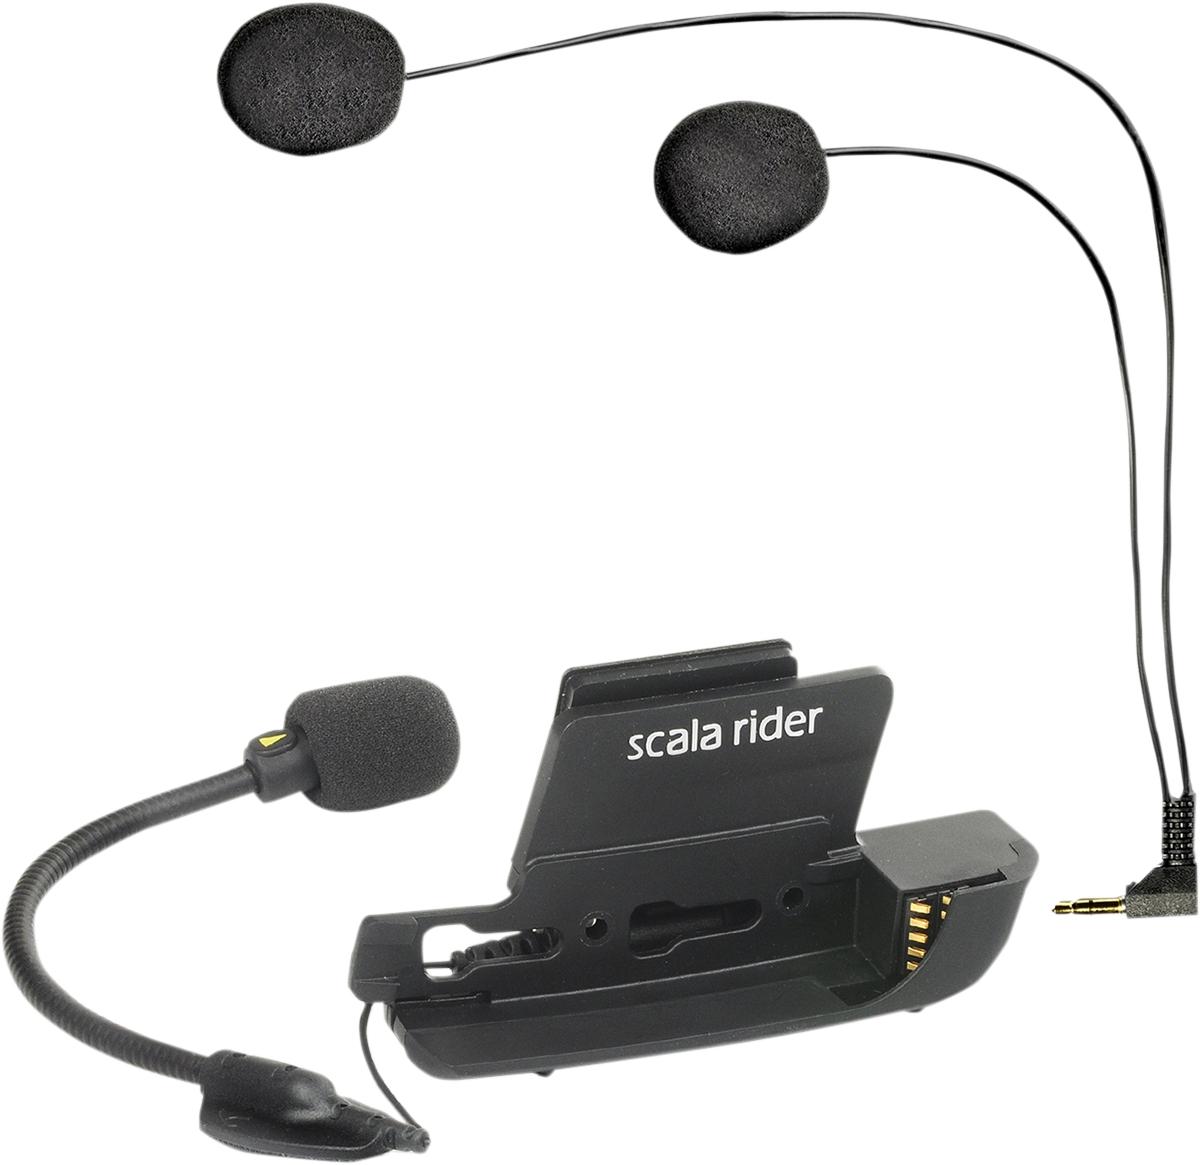 G9/G9X Bike To Bike Audio Kit